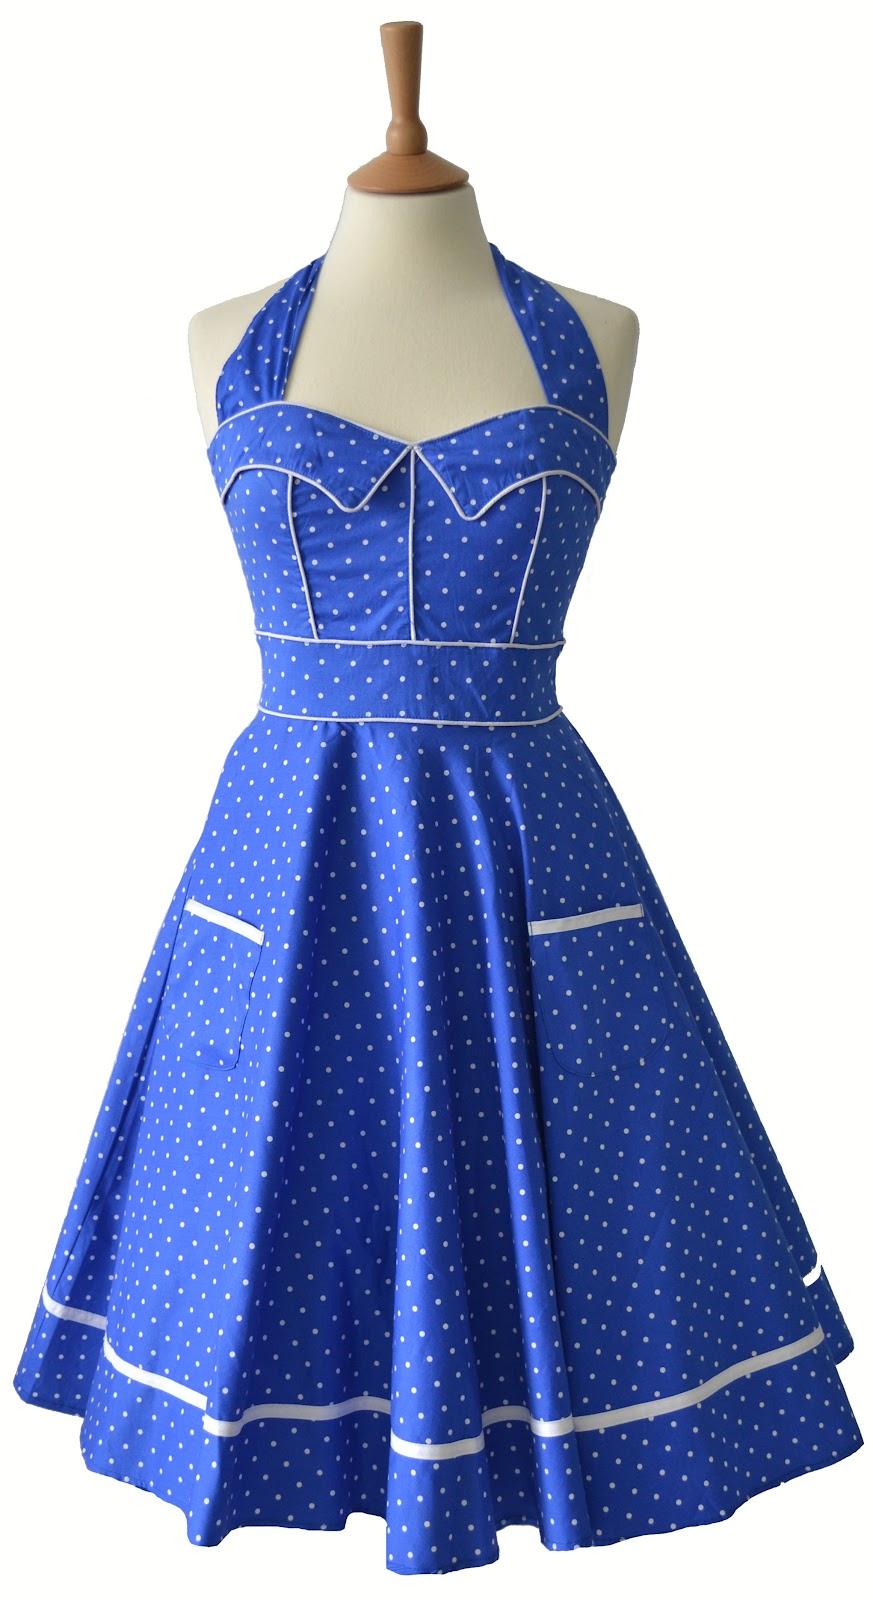 1950 vintage style dresses